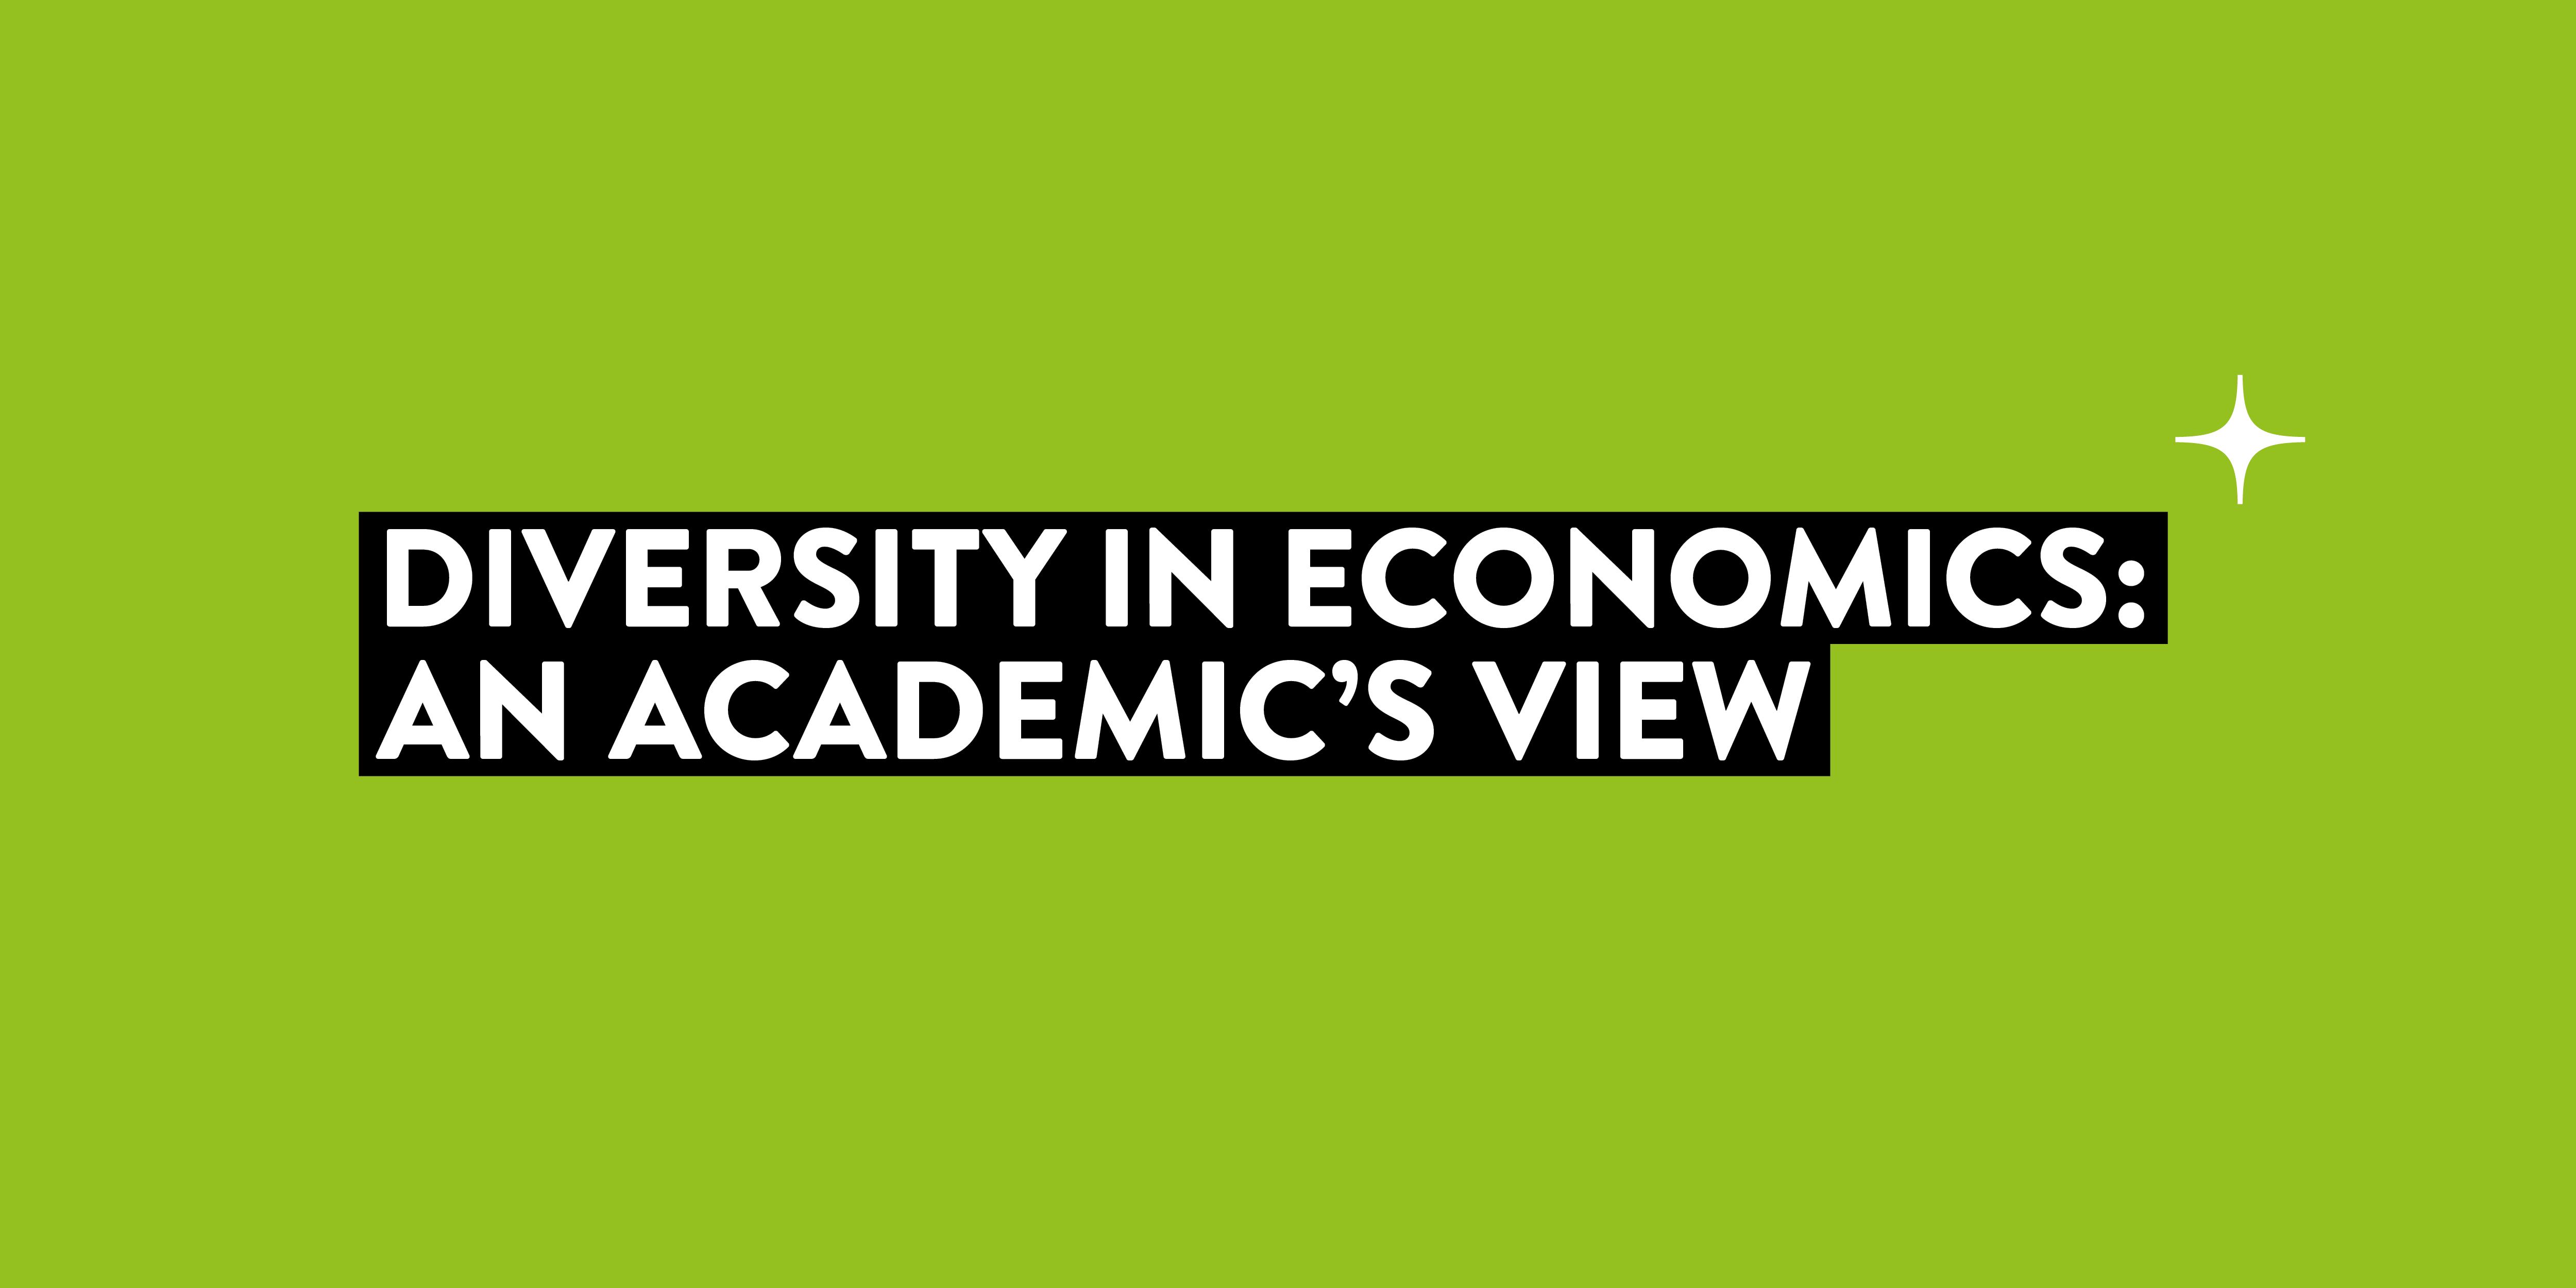 Diversity in Economics: An Academic's View